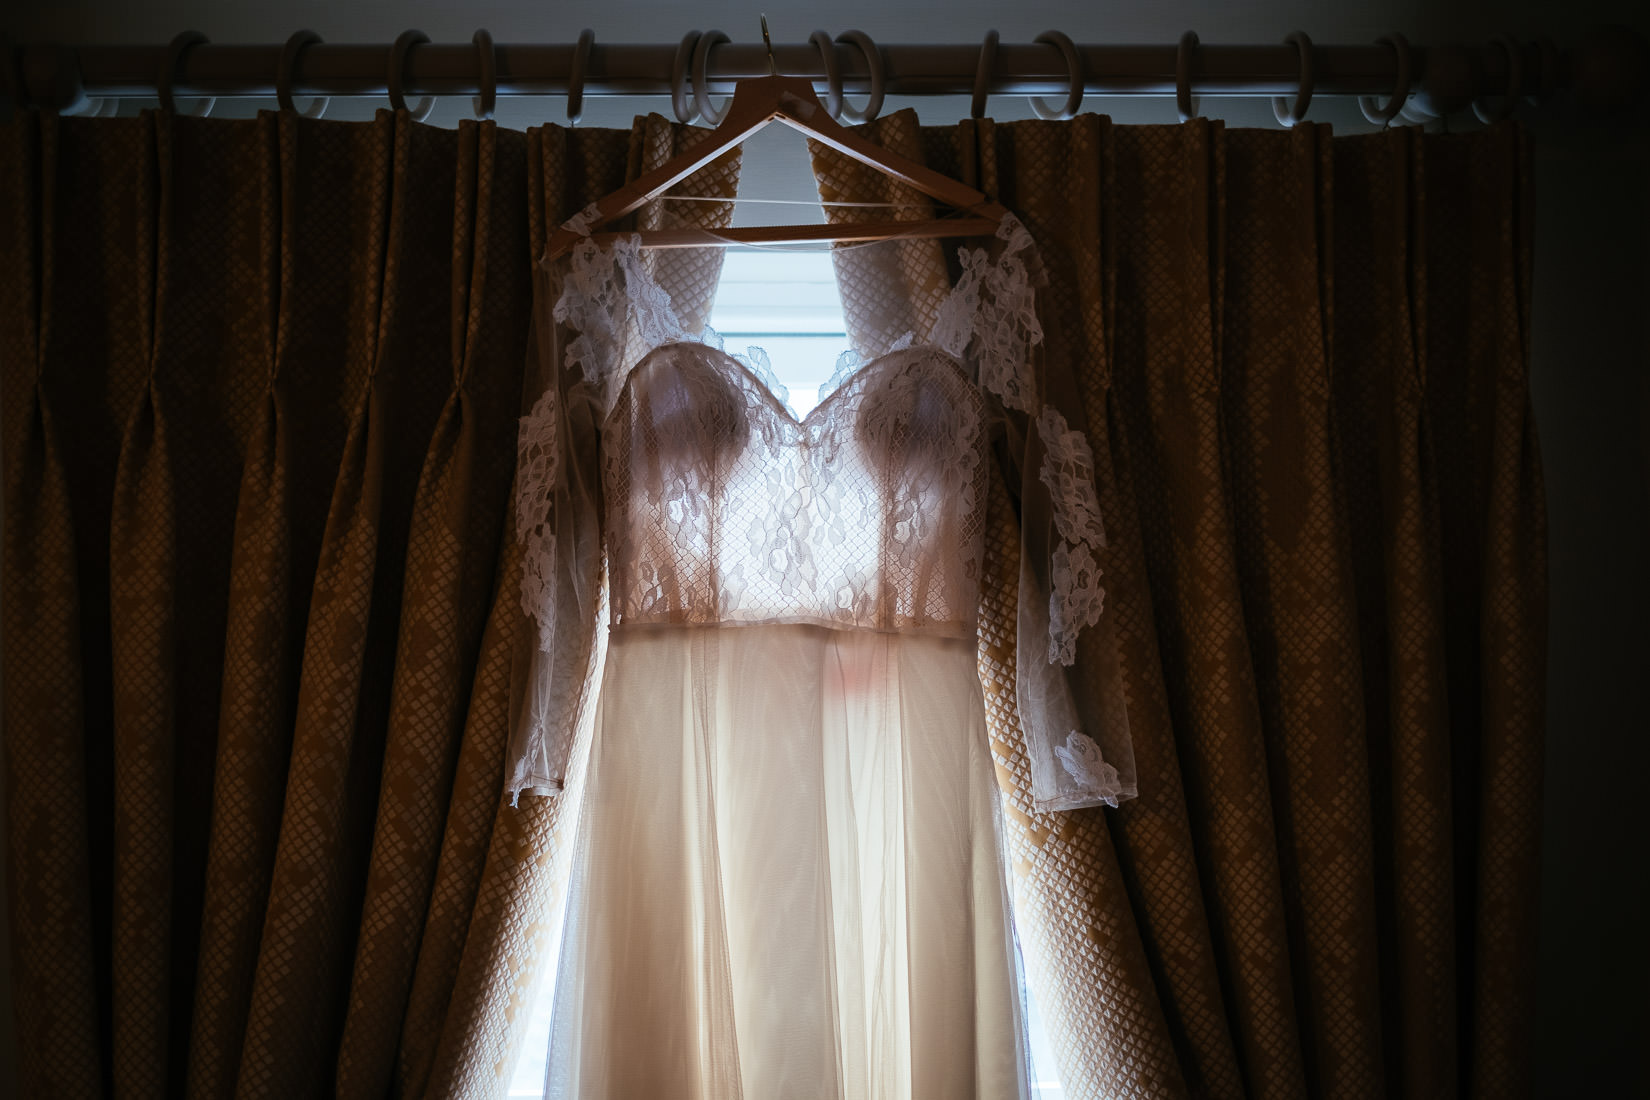 wedding dress hanging in a window